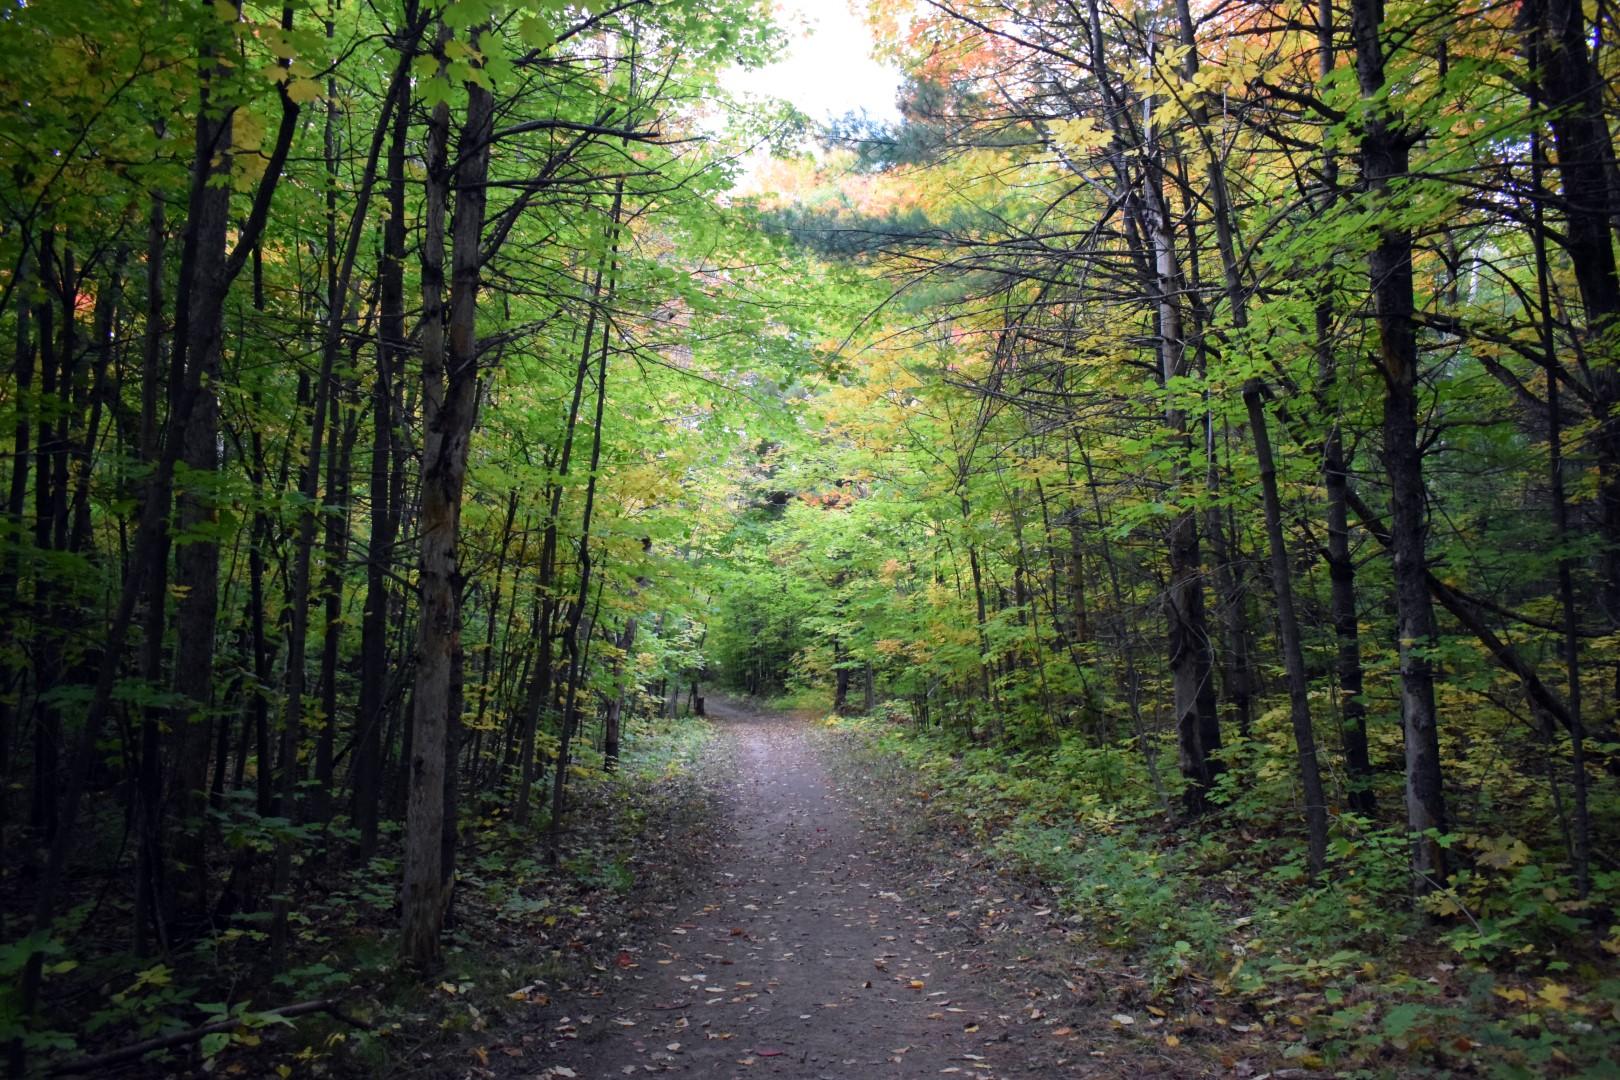 Mackenzie King Estate, Gatineau Park, September 2020